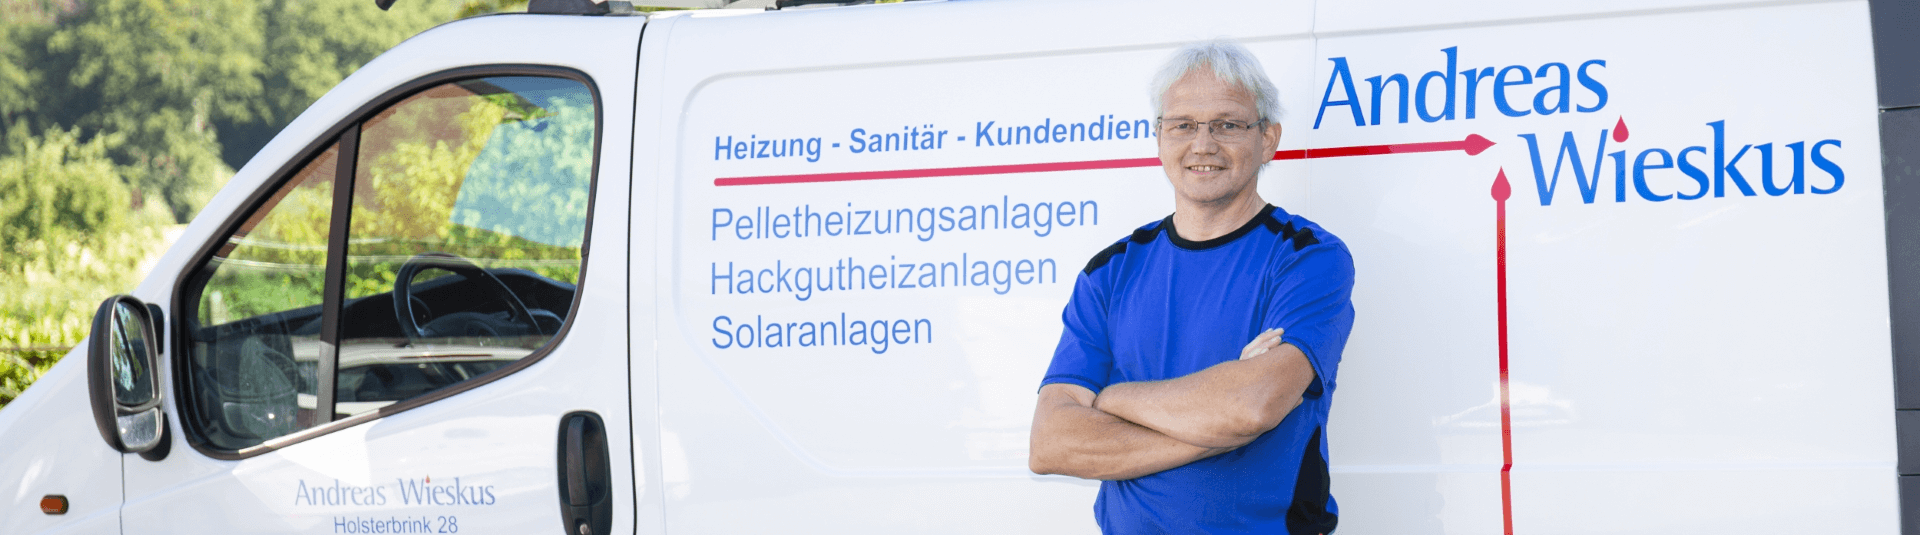 andreas-wieskus-duelmen-sanitaer-heizung-kontakt